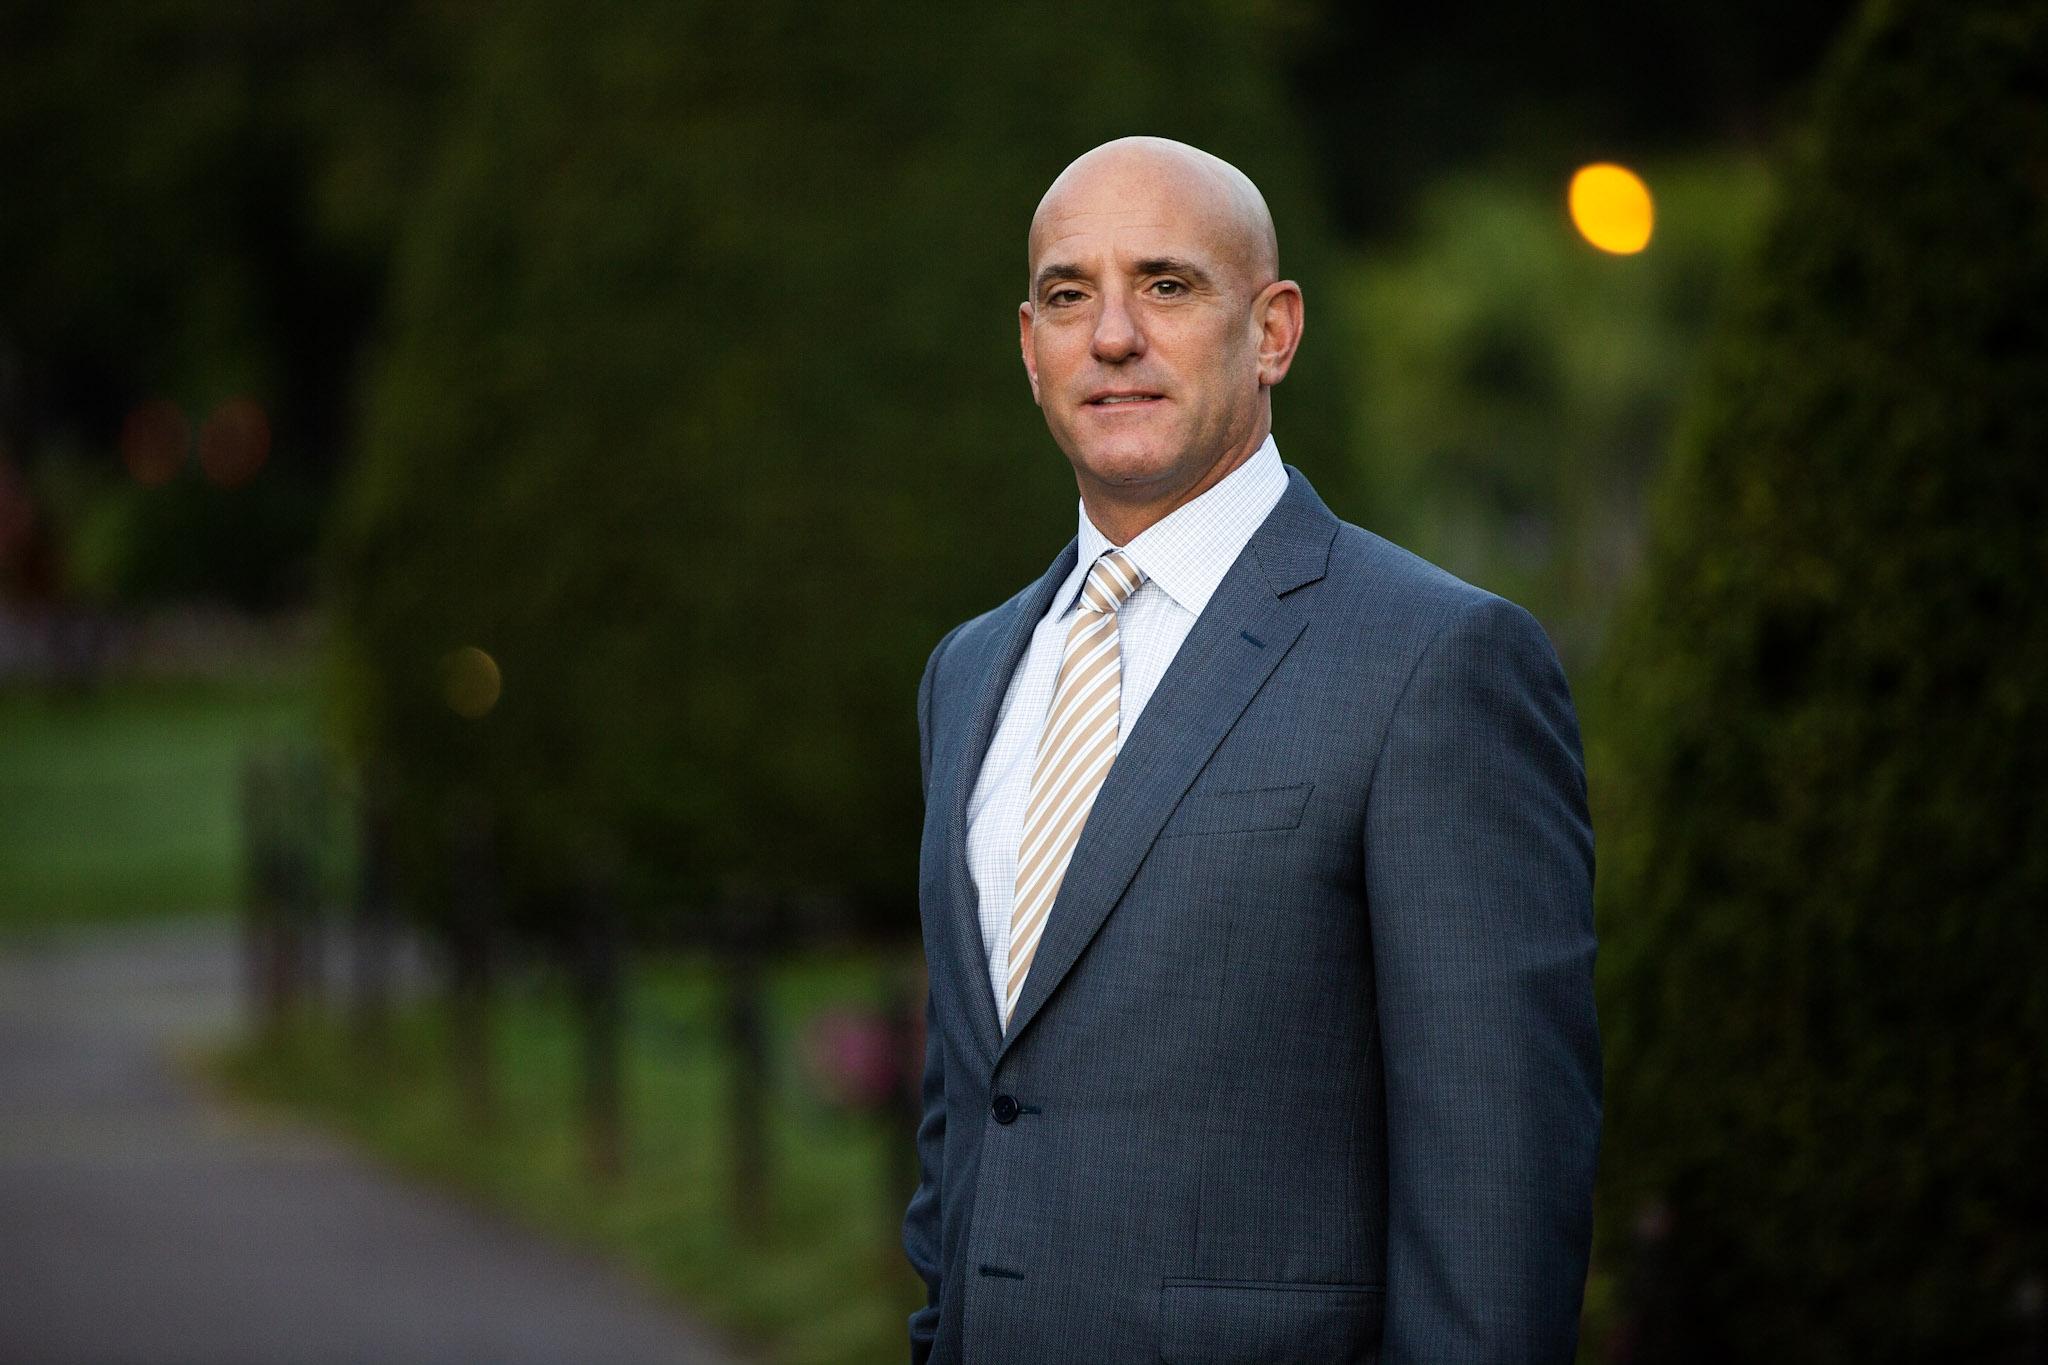 Photo of Demetrios Salpoglou, CEO of Boston Pads